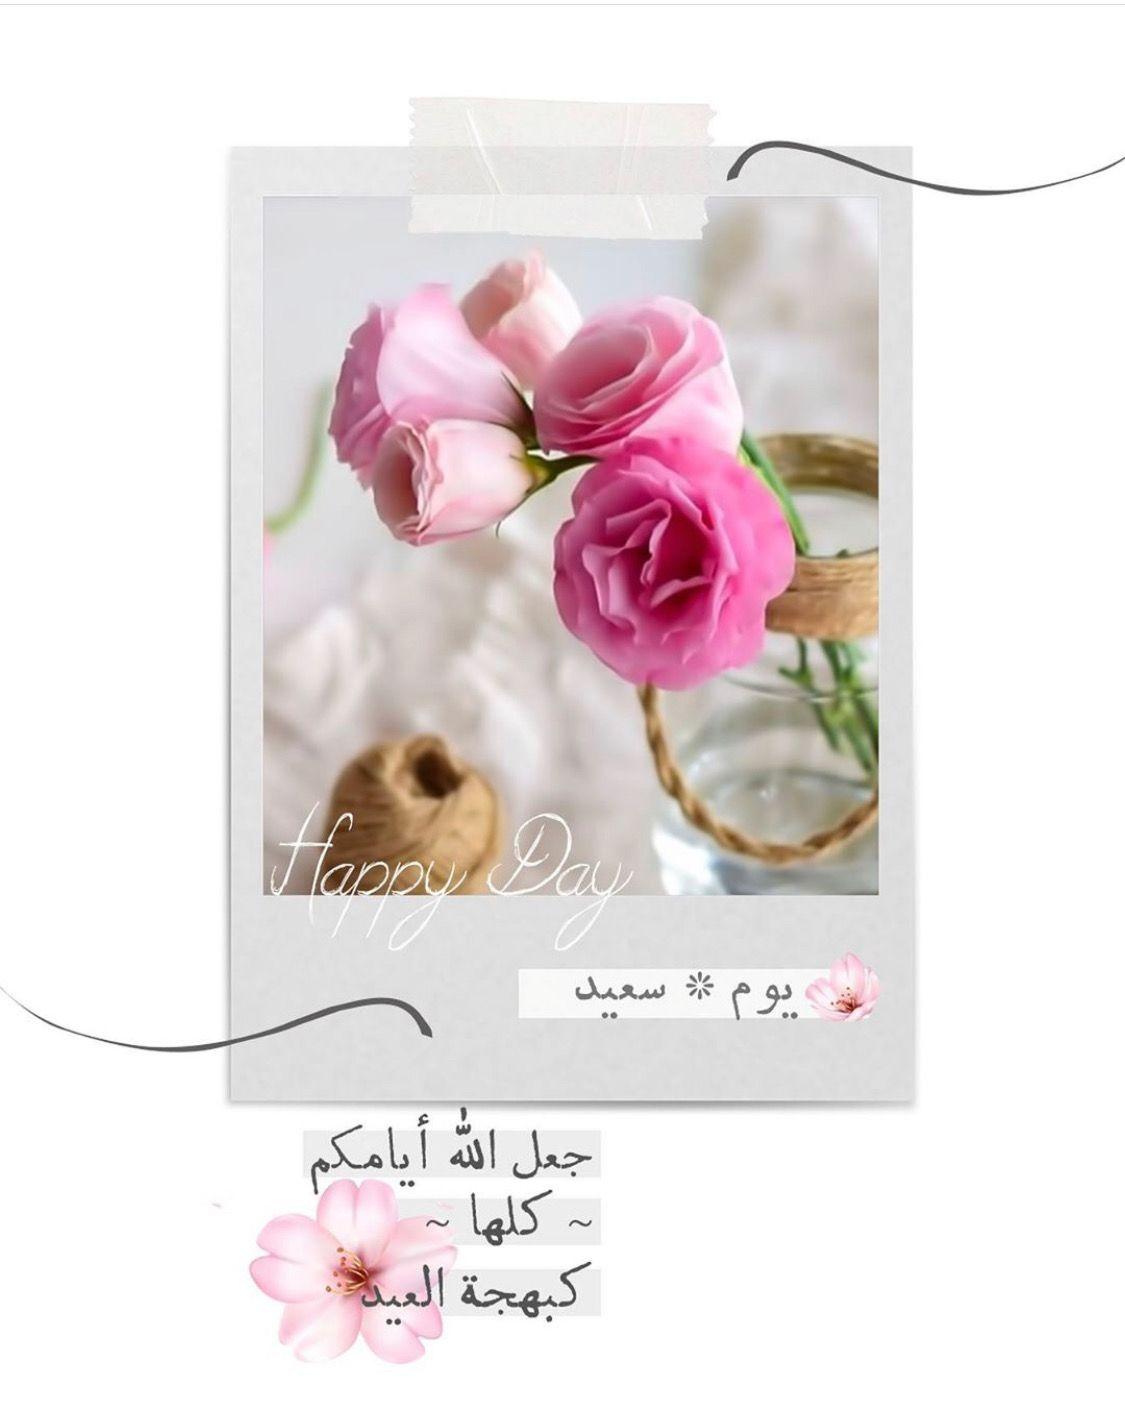 Pin By الأثر الجميل On دعاء Eid Cards Place Card Holders Eid Mubarak